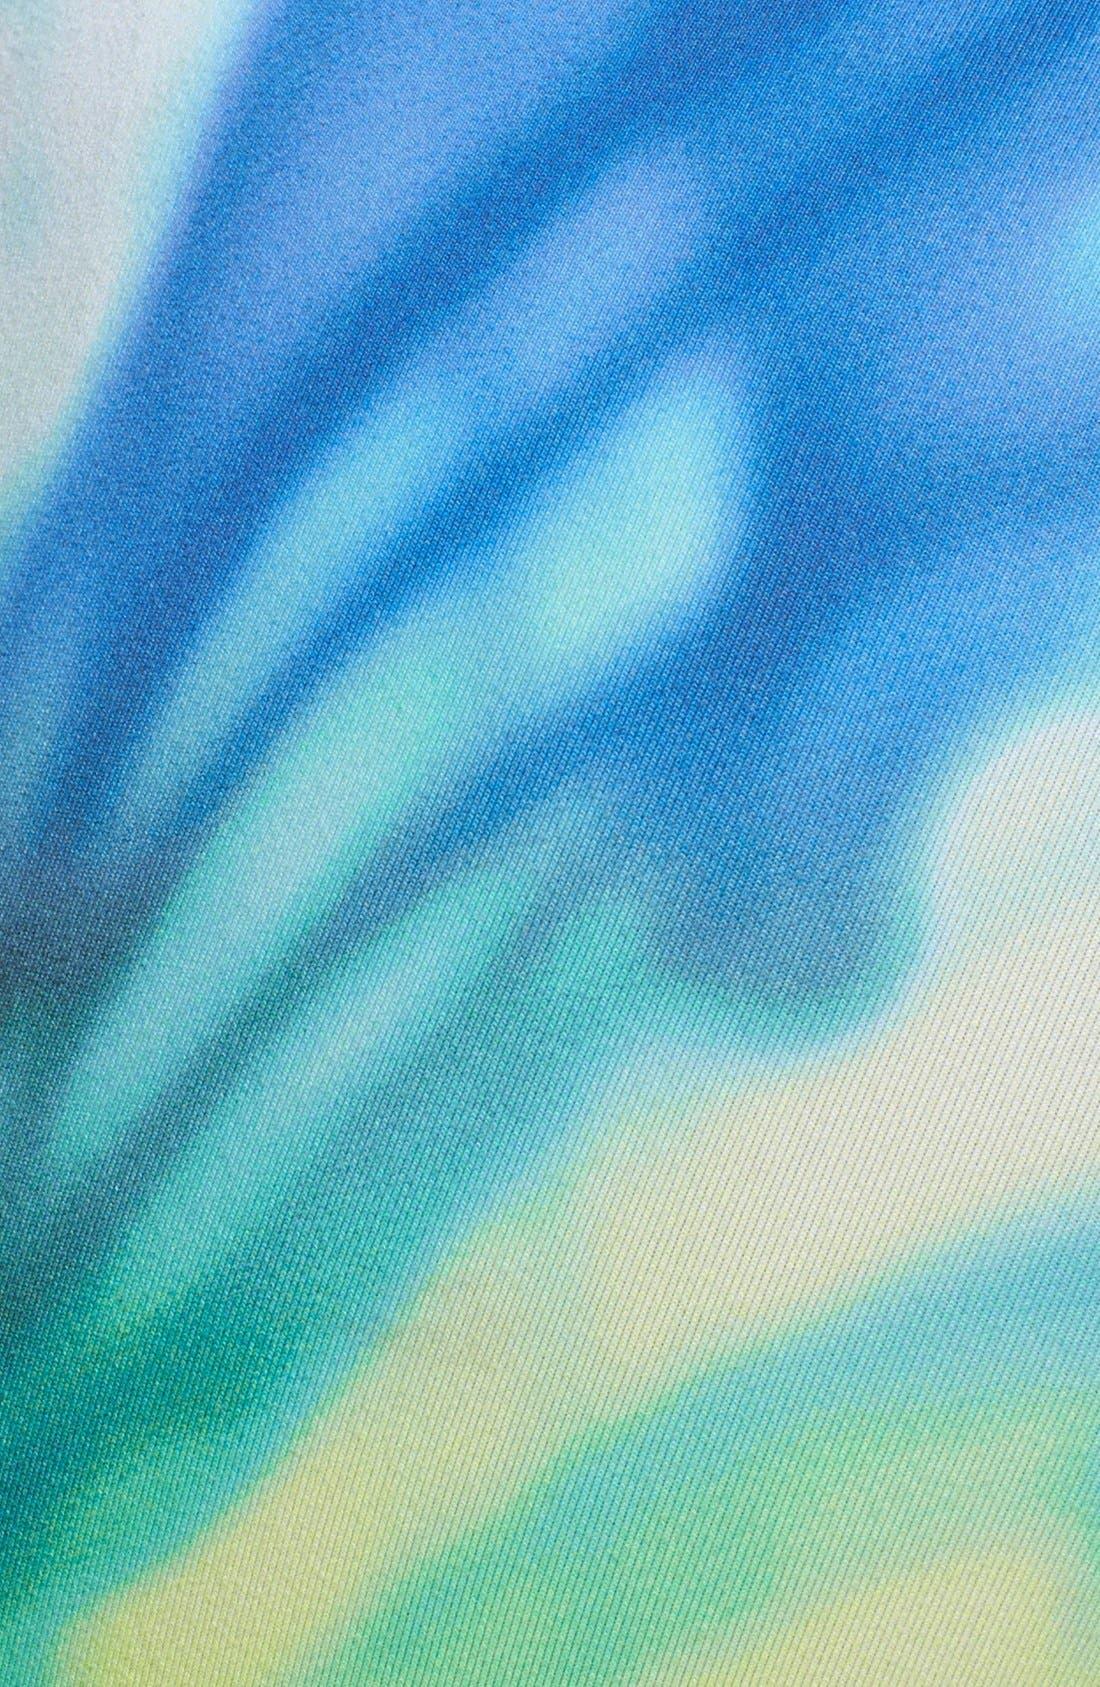 Alternate Image 4  - Nike 'Legendary - Lava' Dri-FIT Tights